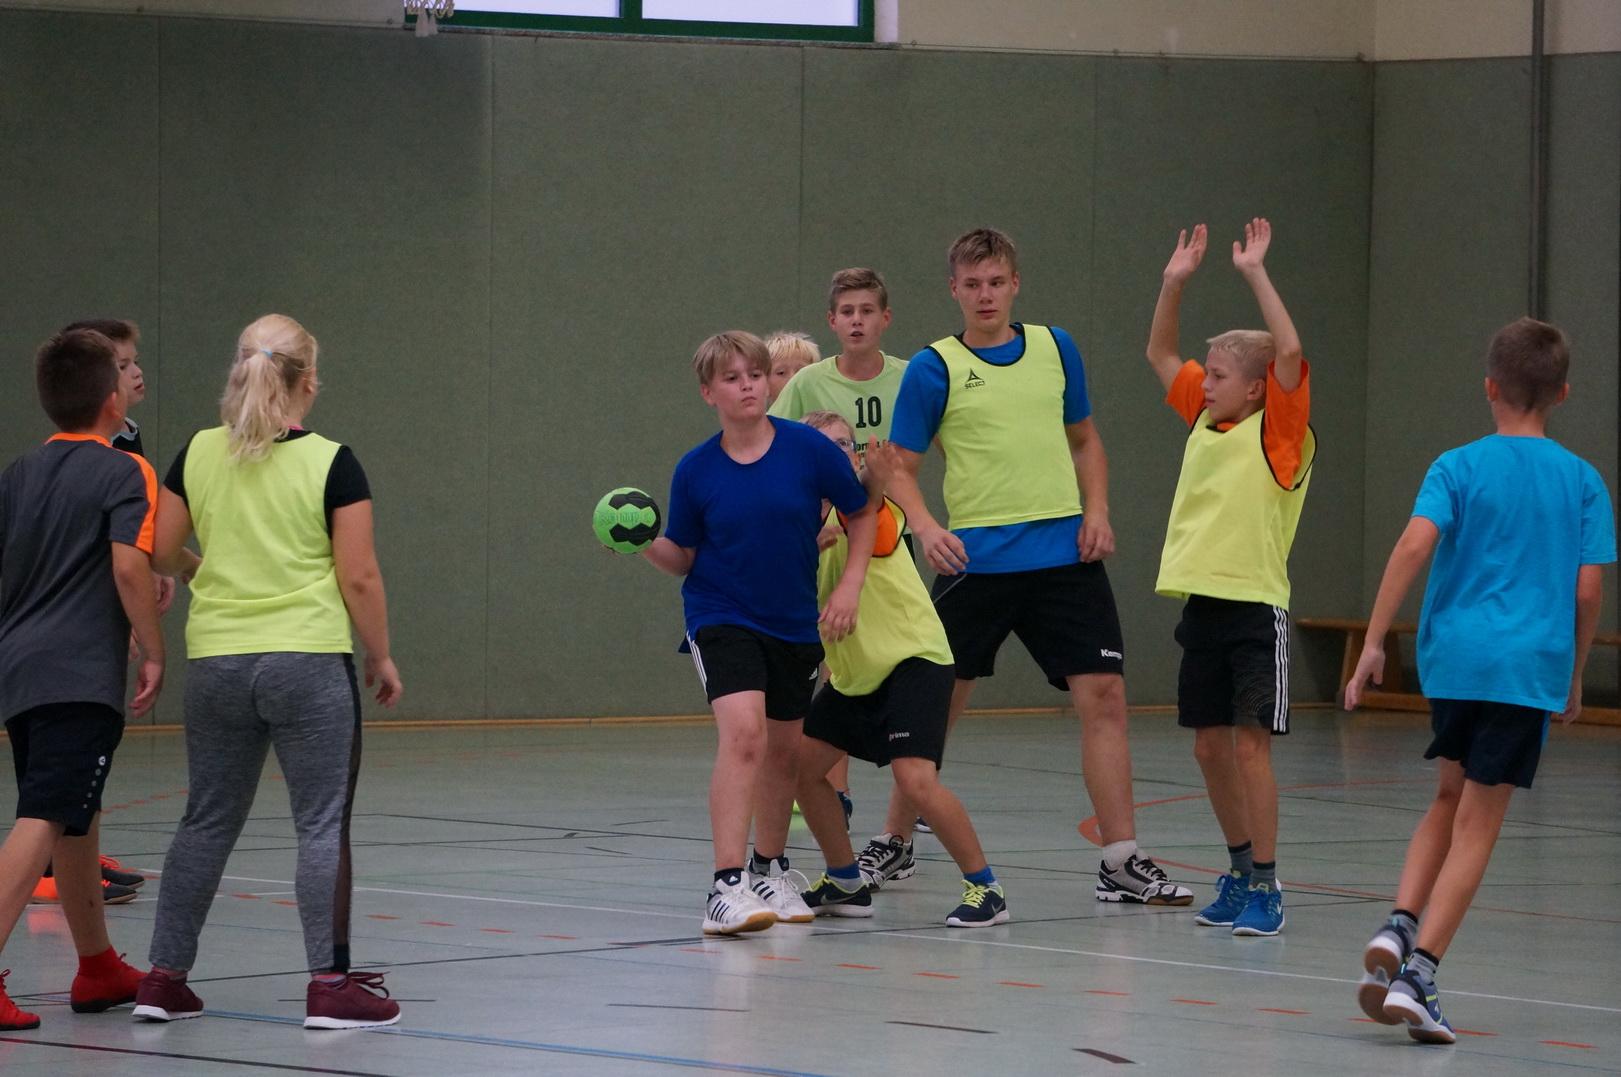 201808_Handballcamp_SDH_MG_117w